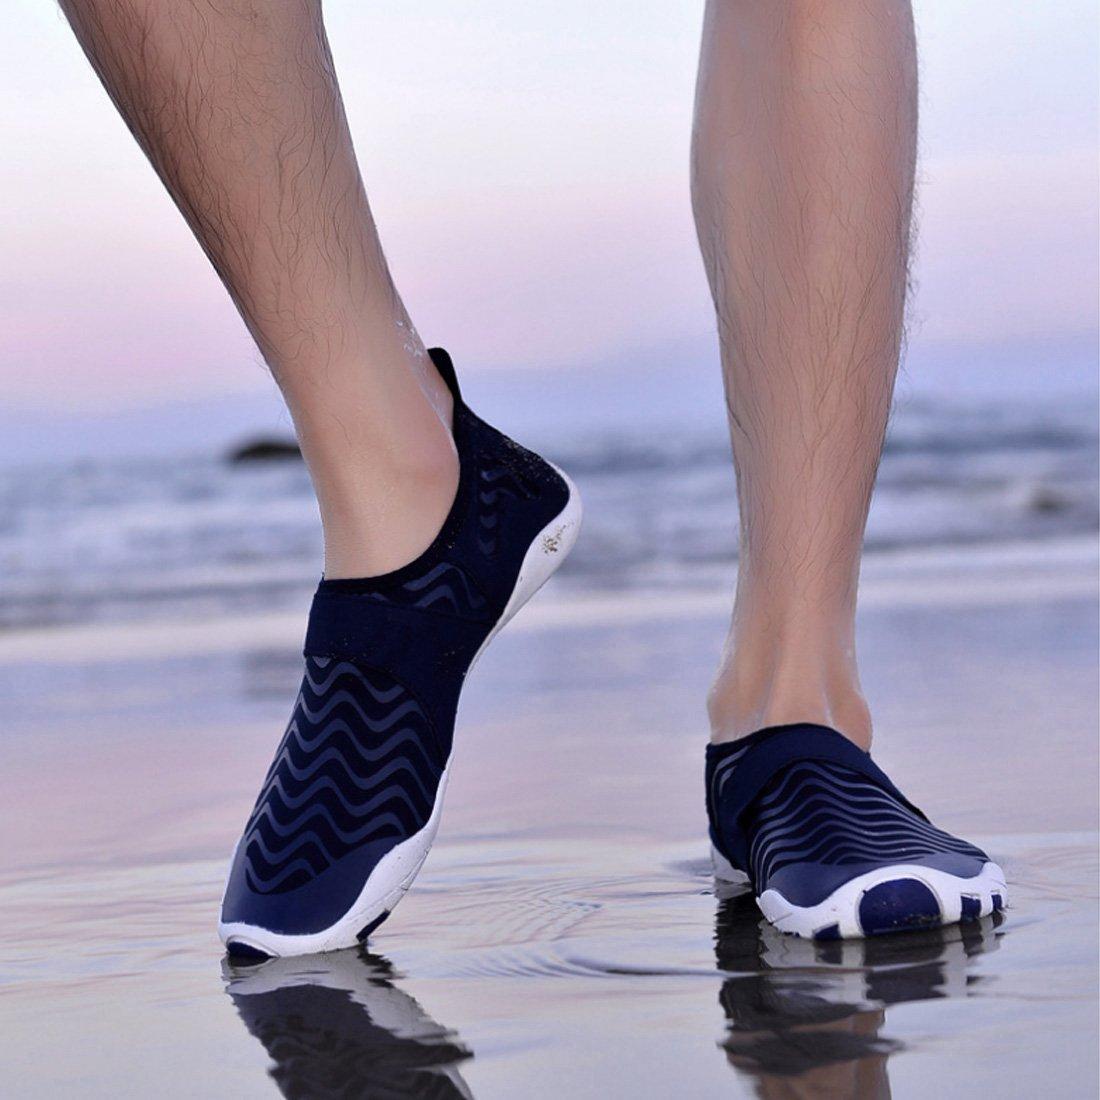 058e598fc92f ... Water Shoes Quick Dry Aqua Aqua Aqua Shoes Barefoot Shoes for Water  Sports Rubber Sole B07DMFS7HQ